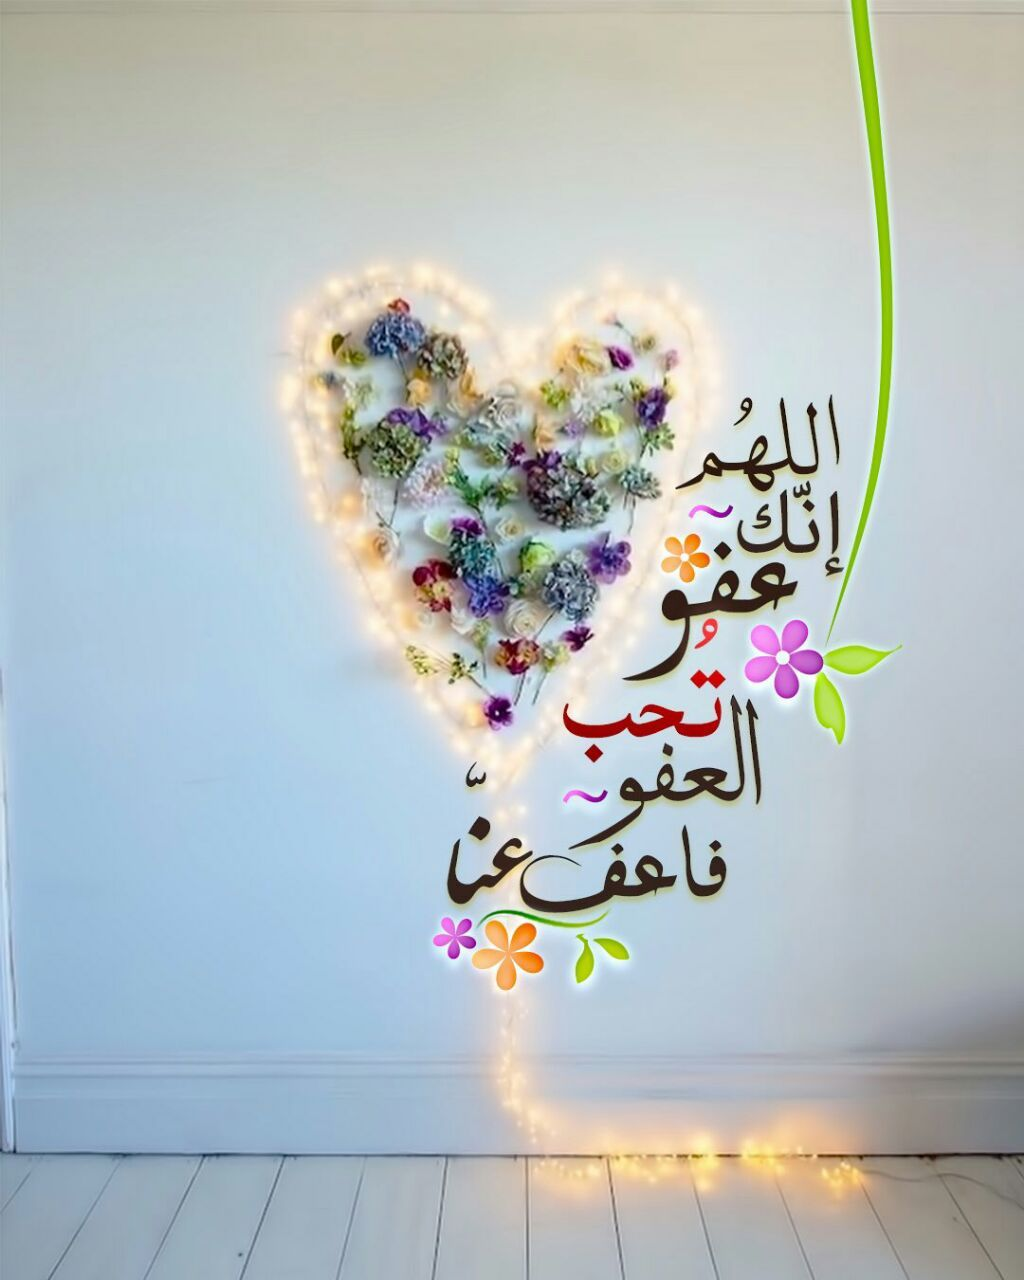 Pin By Maxabatul Islaam On دعاء Islamic Pictures Islamic Wall Art Eid Greetings